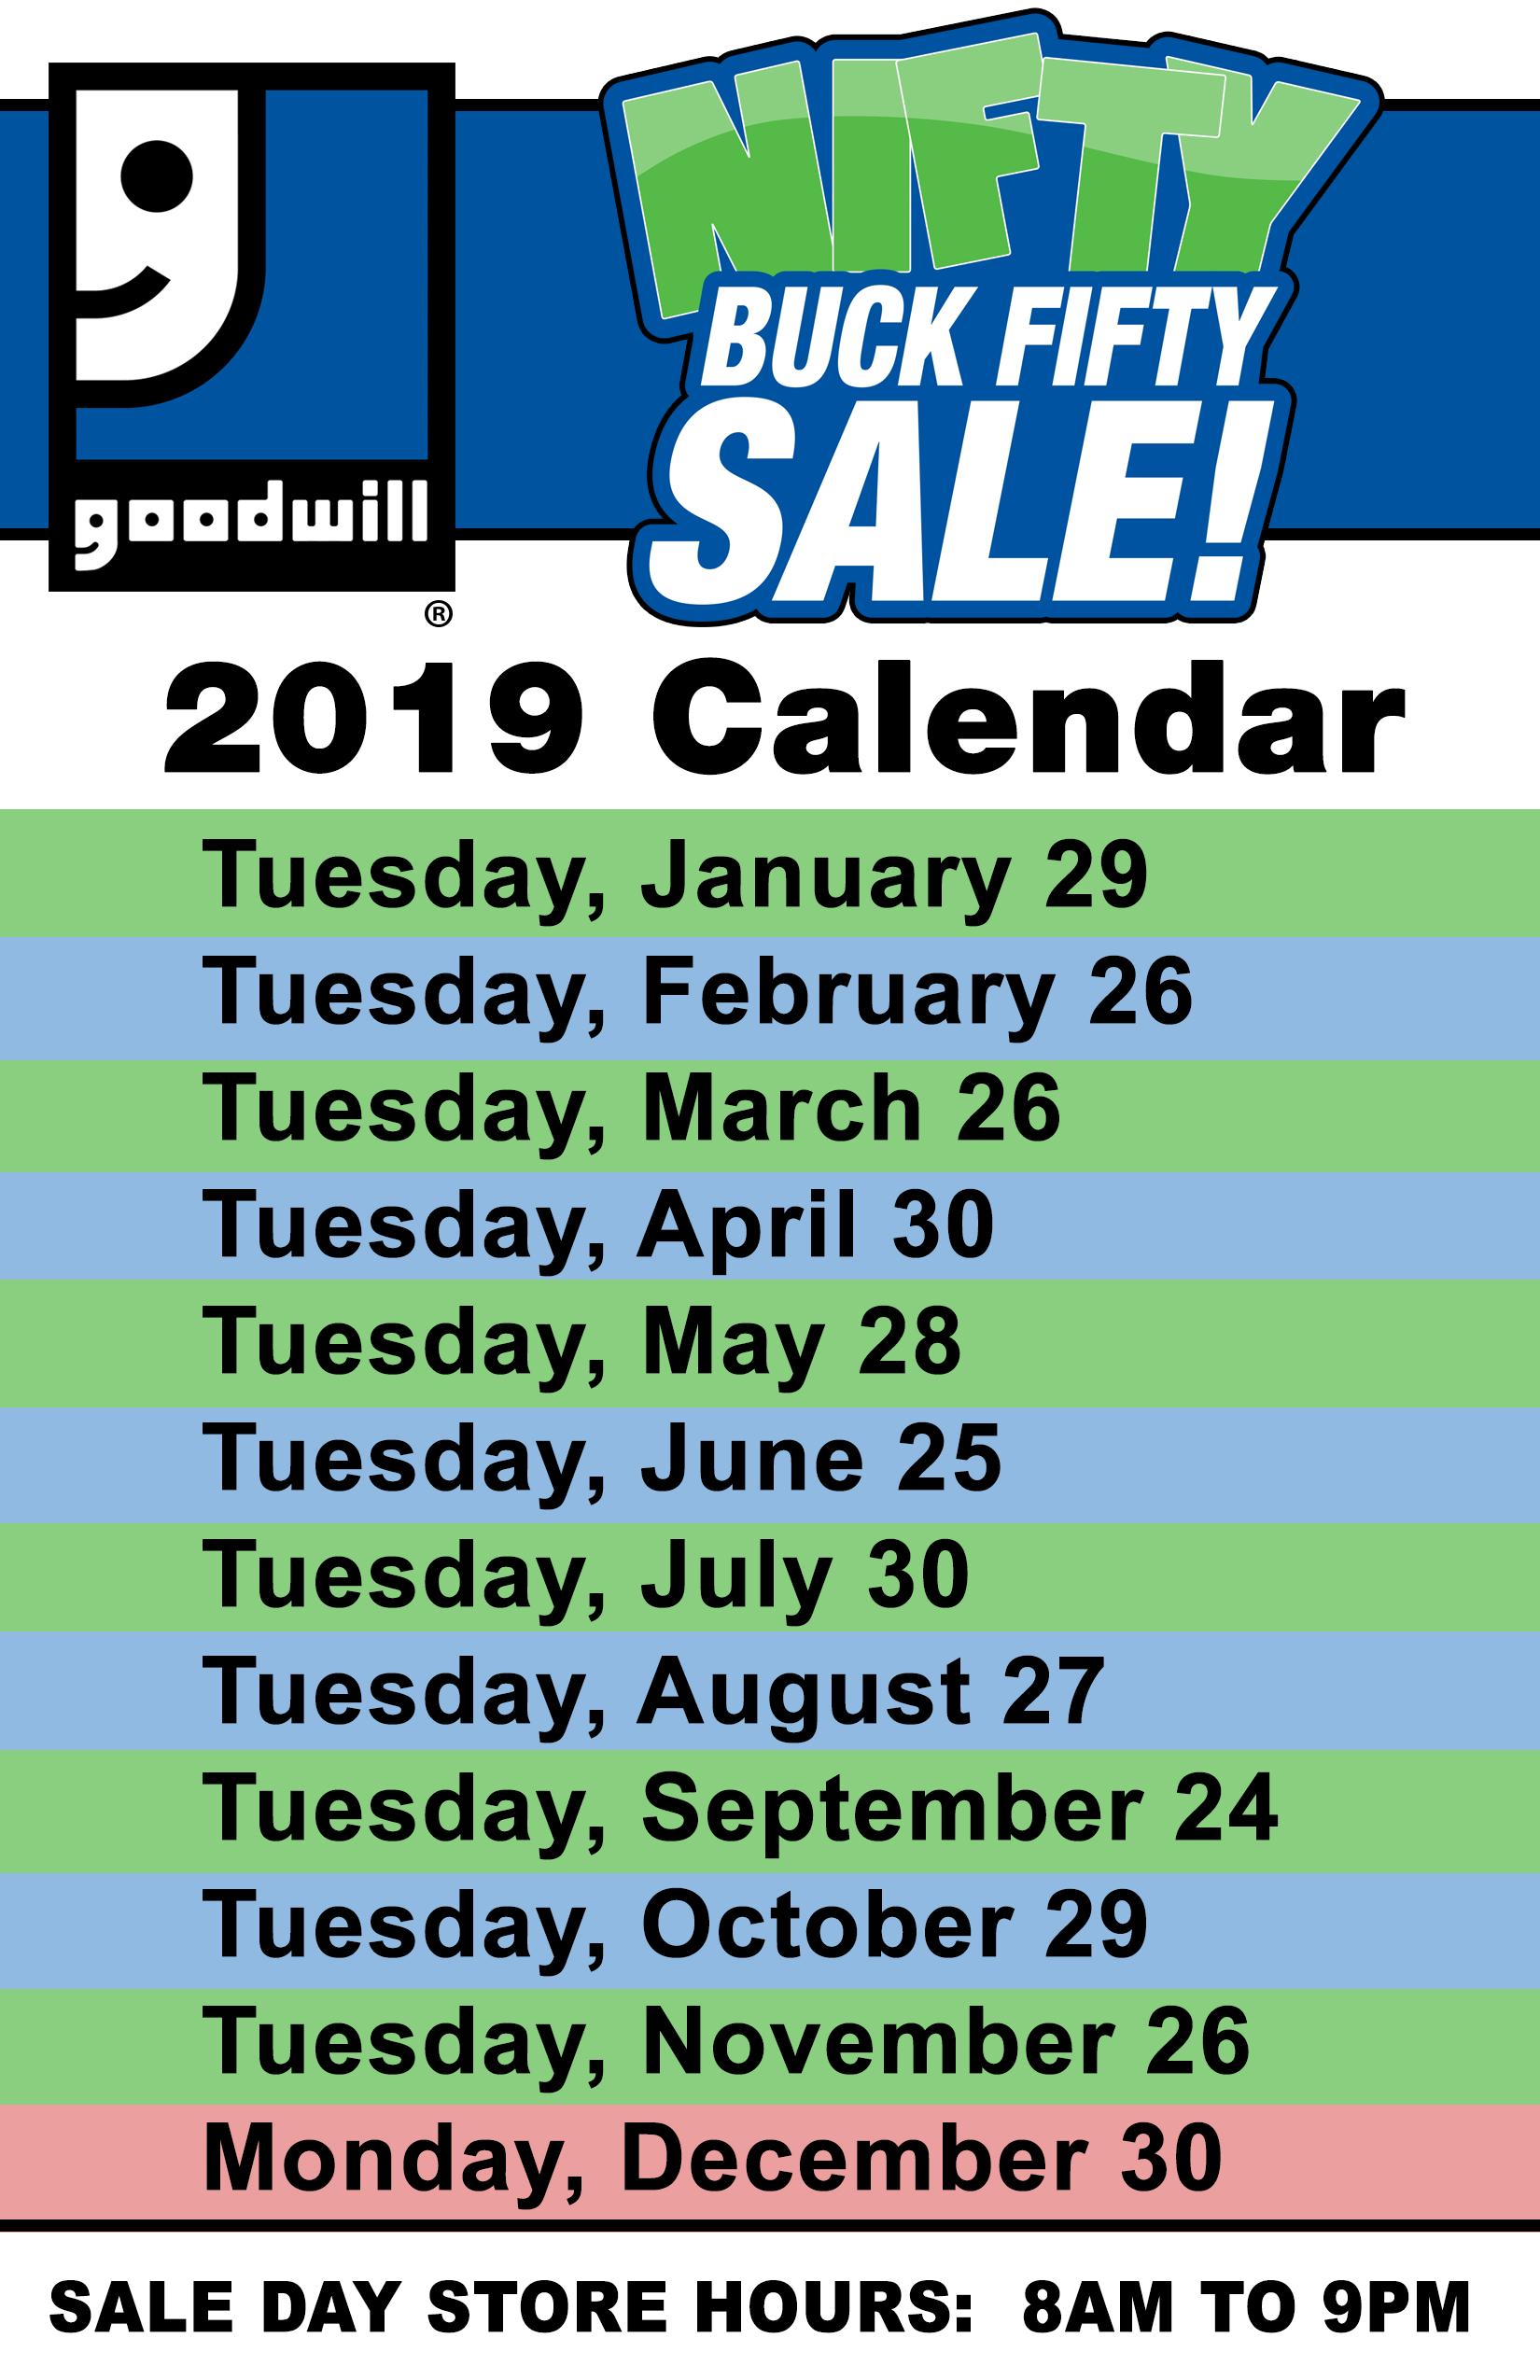 Goodwill February 2019 Sales Calendar BagStuffer_Back   Goodwill Industries of Northern Illinois